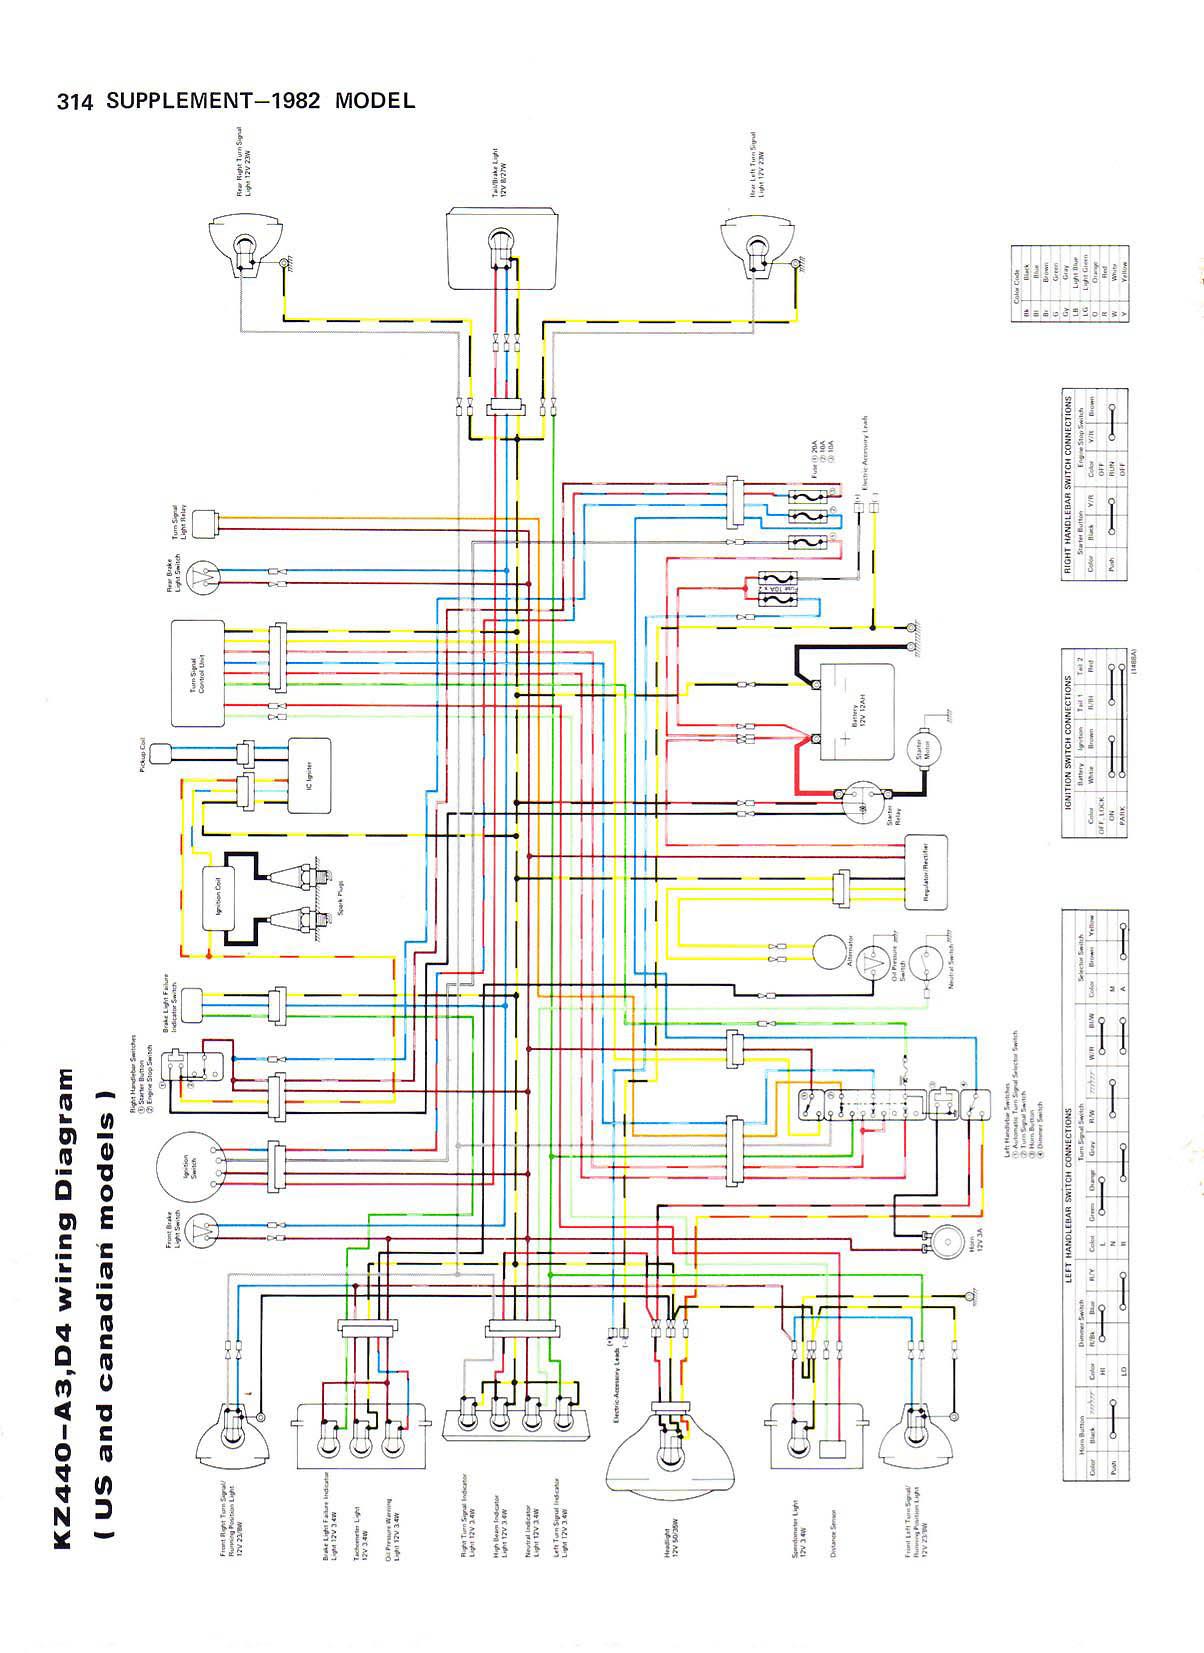 1982 Yamaha Xj750 Wiring Diagram 115 Volt Ac Motor Wiring Diagram Cts Lsa Jeanjaures37 Fr